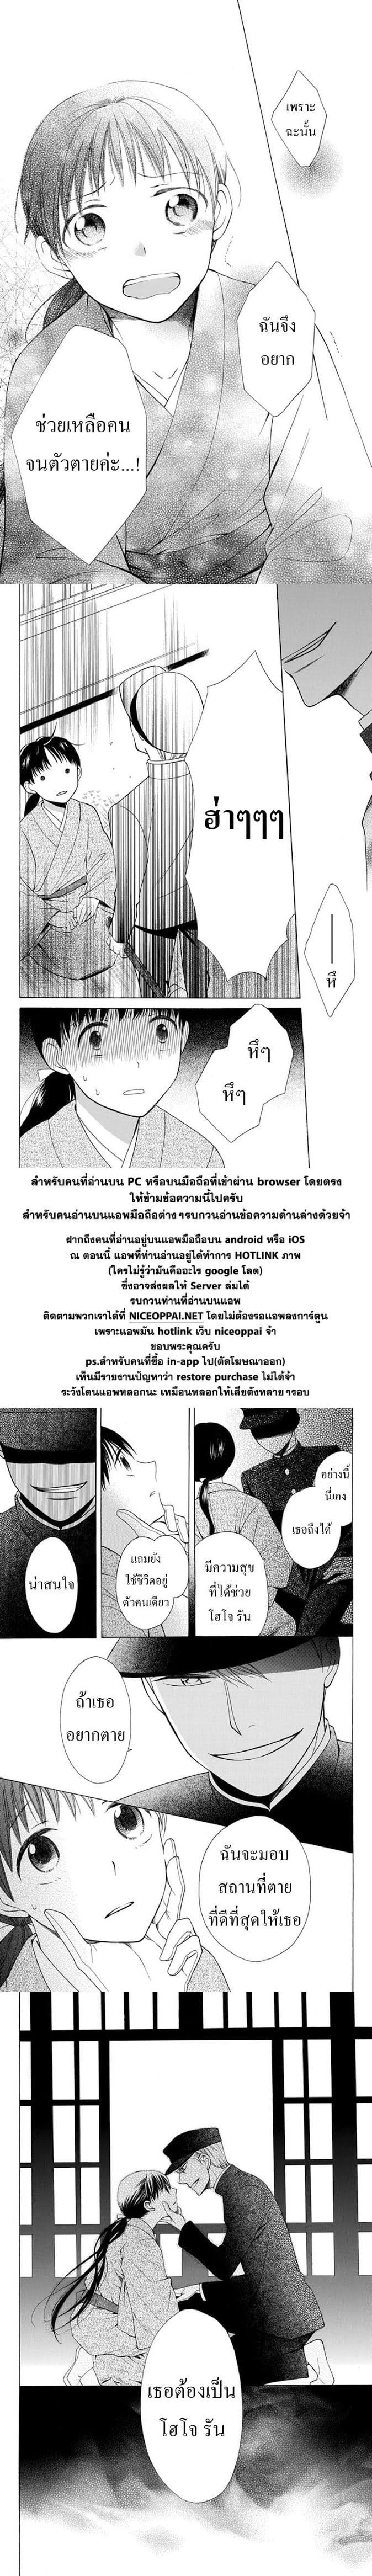 Tendou-ke Monogatari - หน้า 40